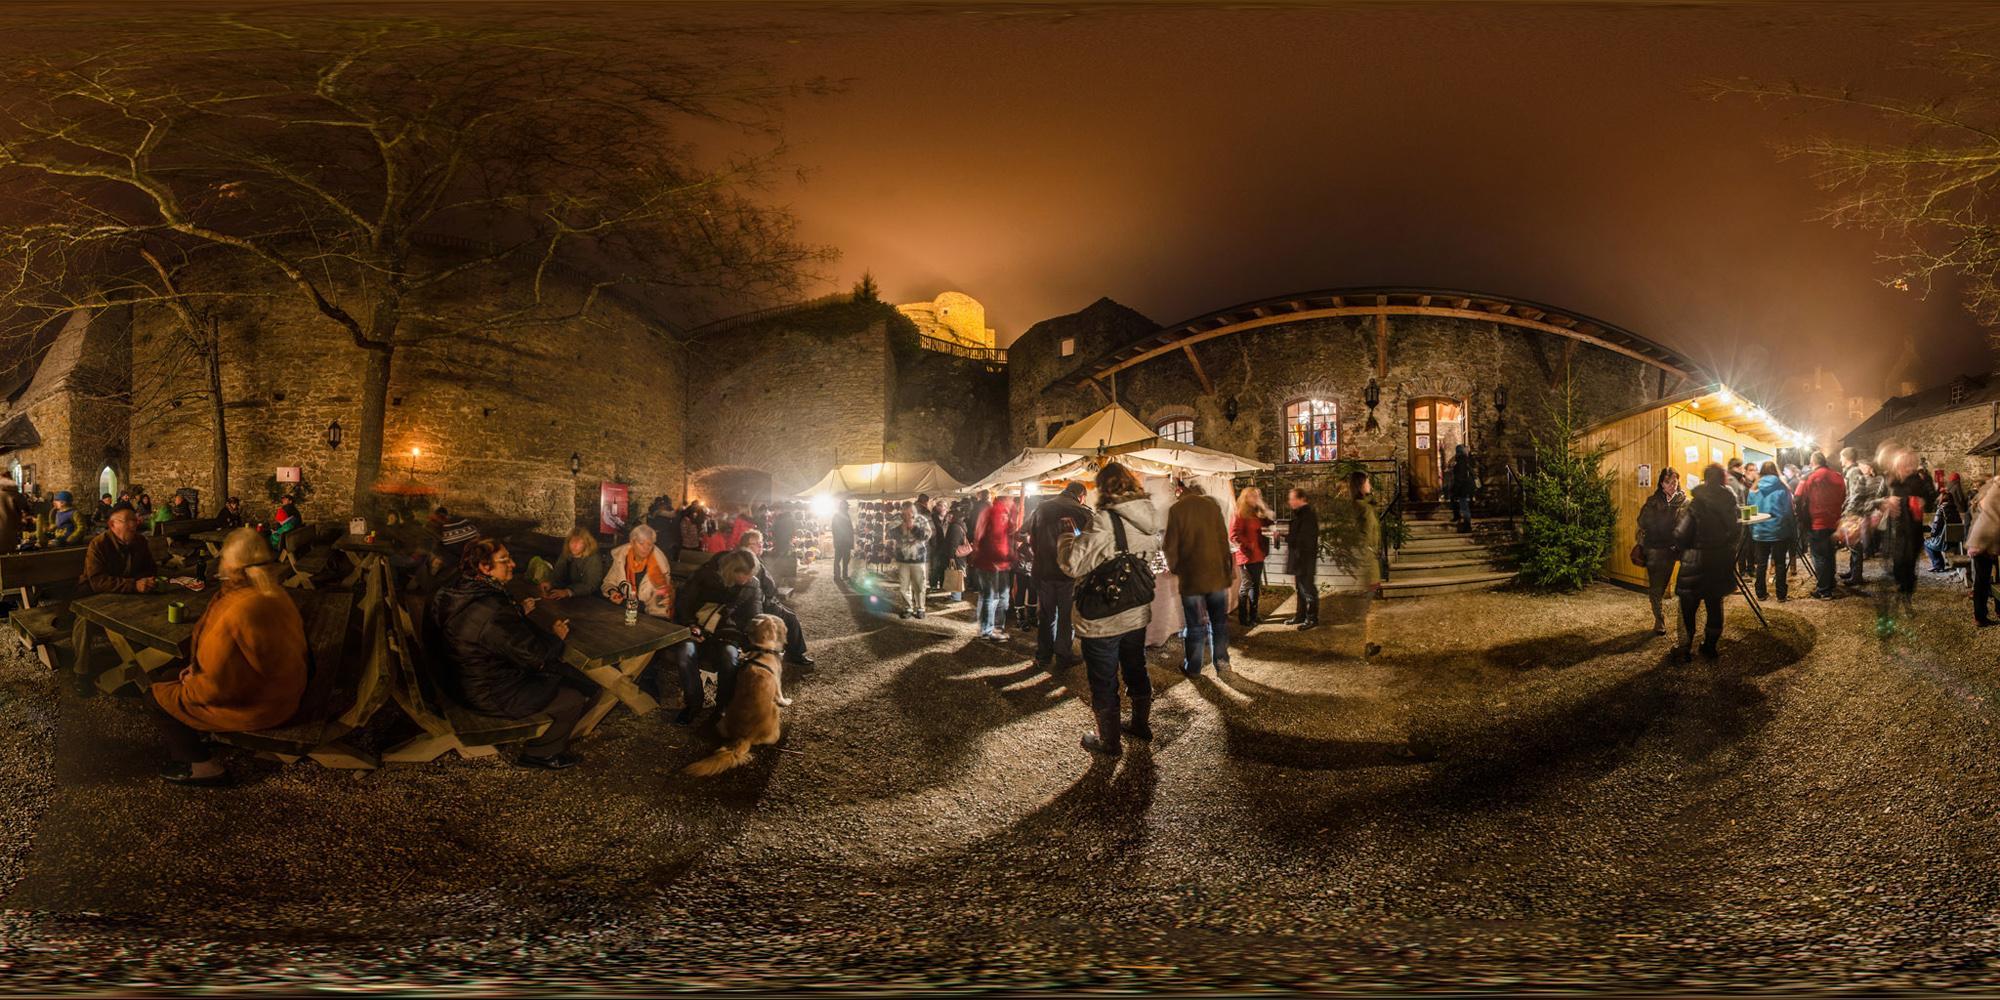 The Christmas market in November is an annual highlight at Aggstein. – © Sebastian Weg-Erbauer / Schlossgut Schönbühel-Aggstein